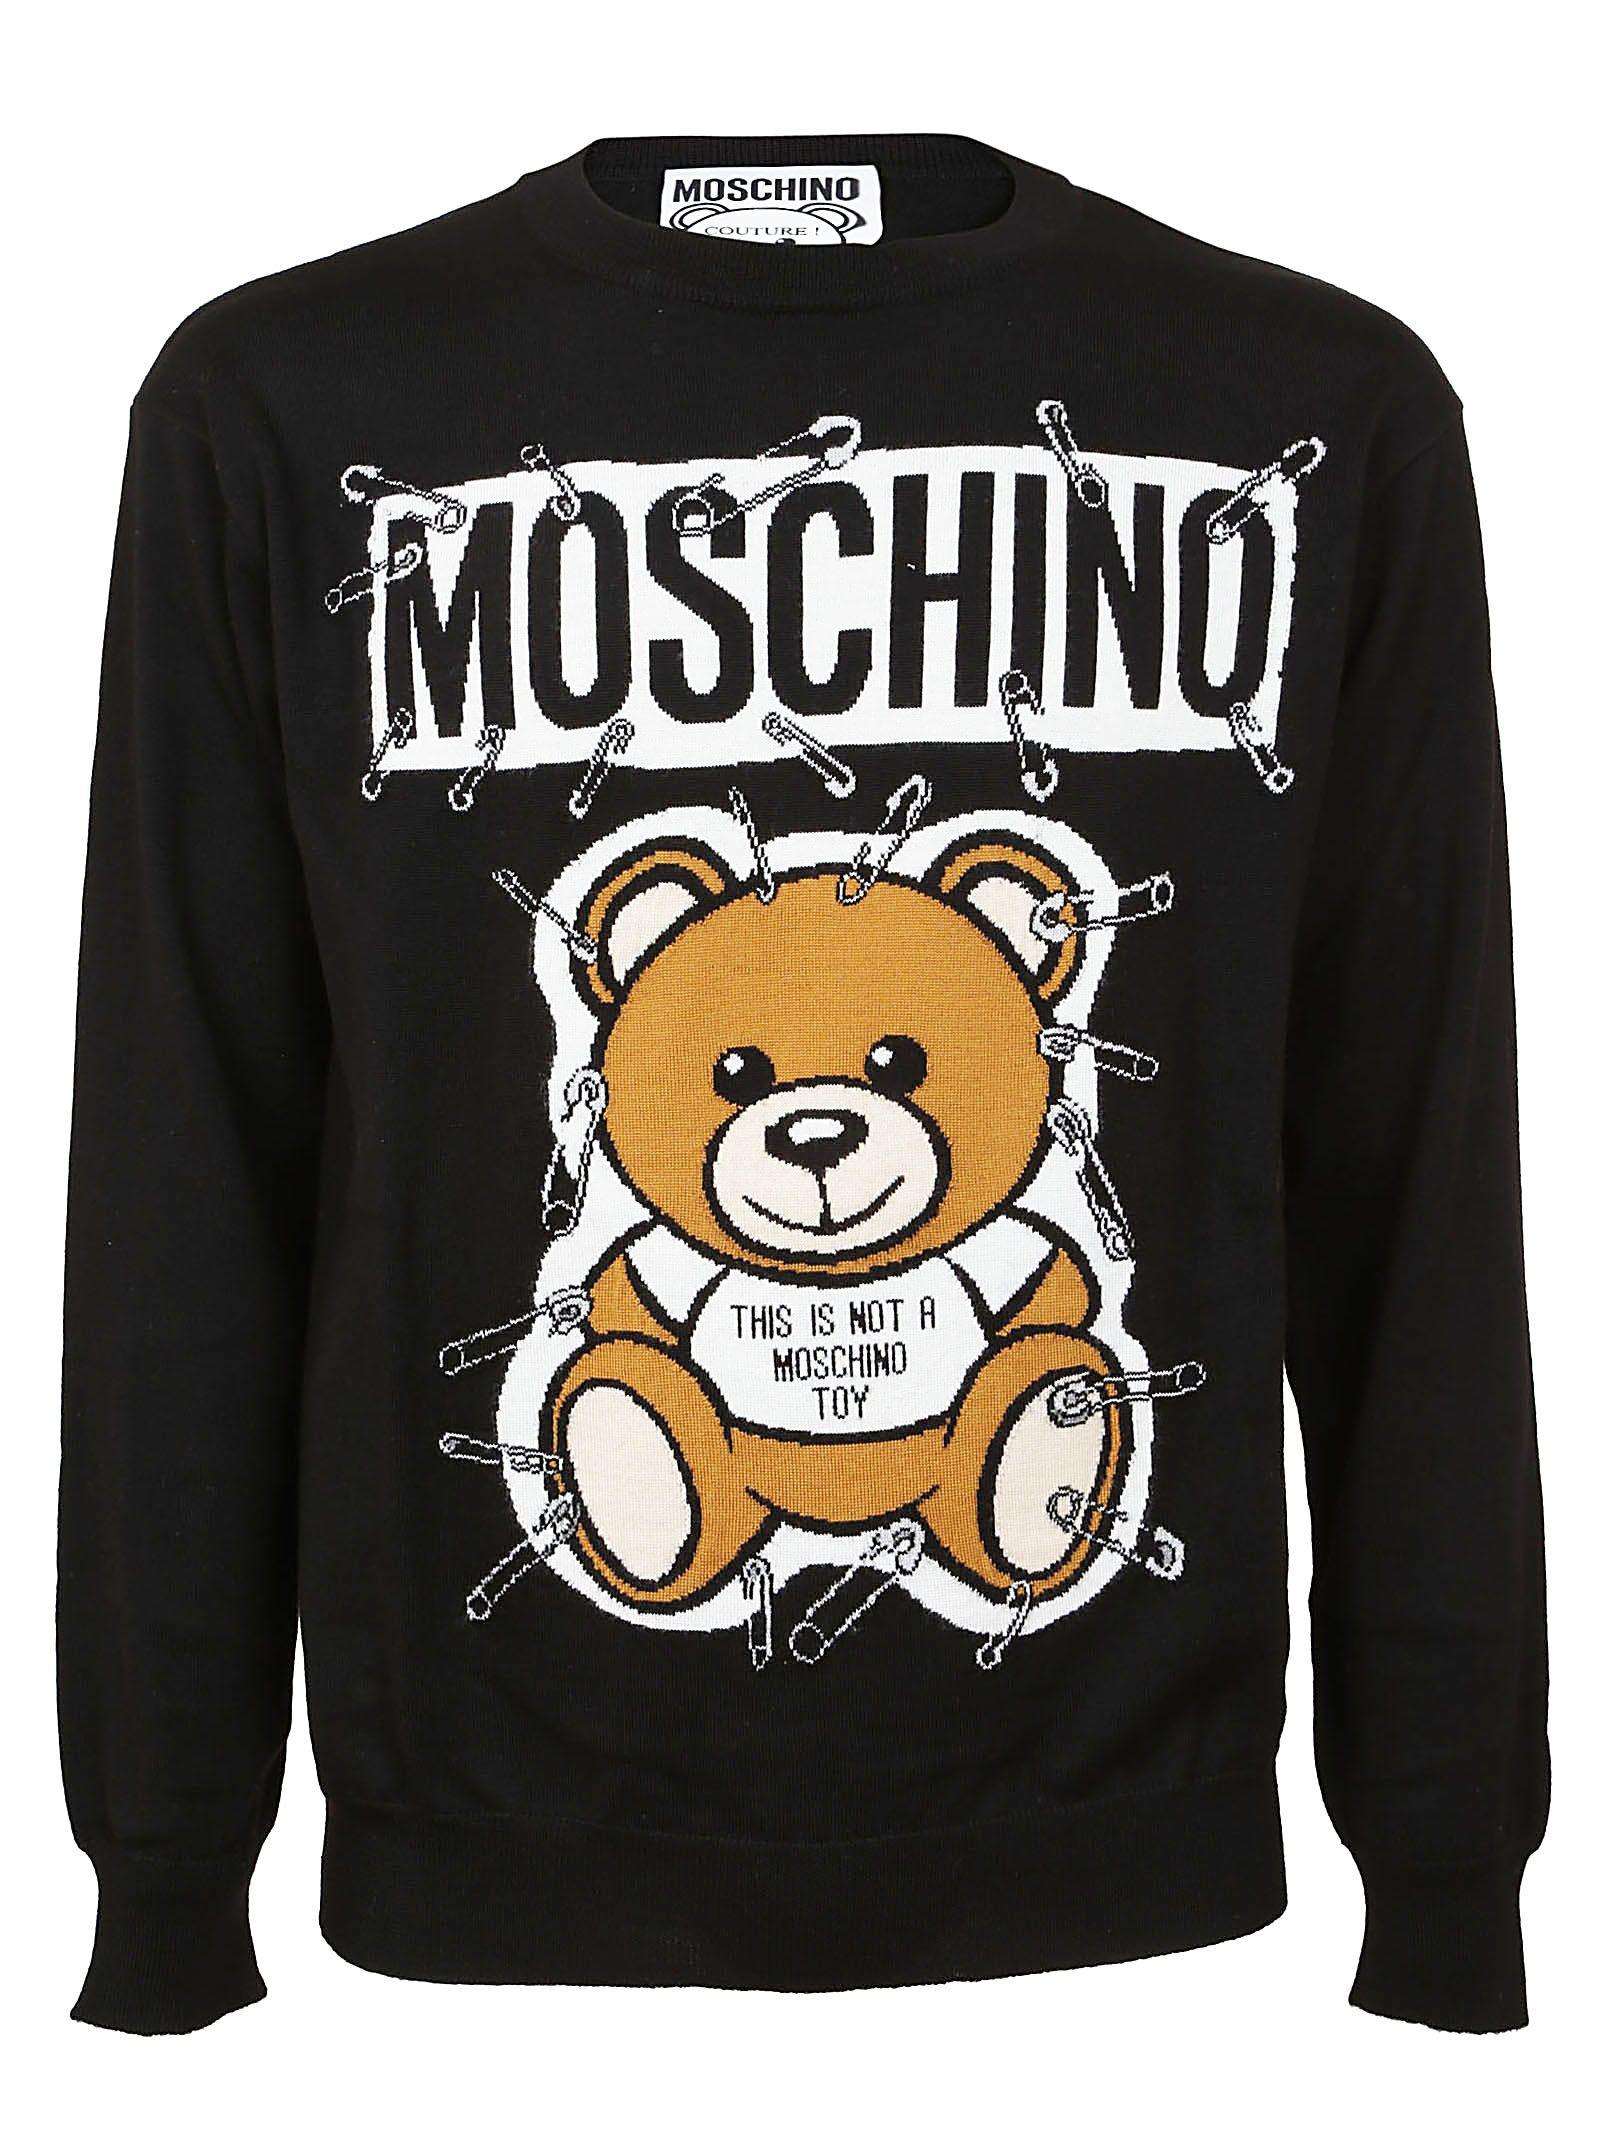 684dfe6e87d MOSCHINO 回形针小熊套头衫.  moschino  cloth